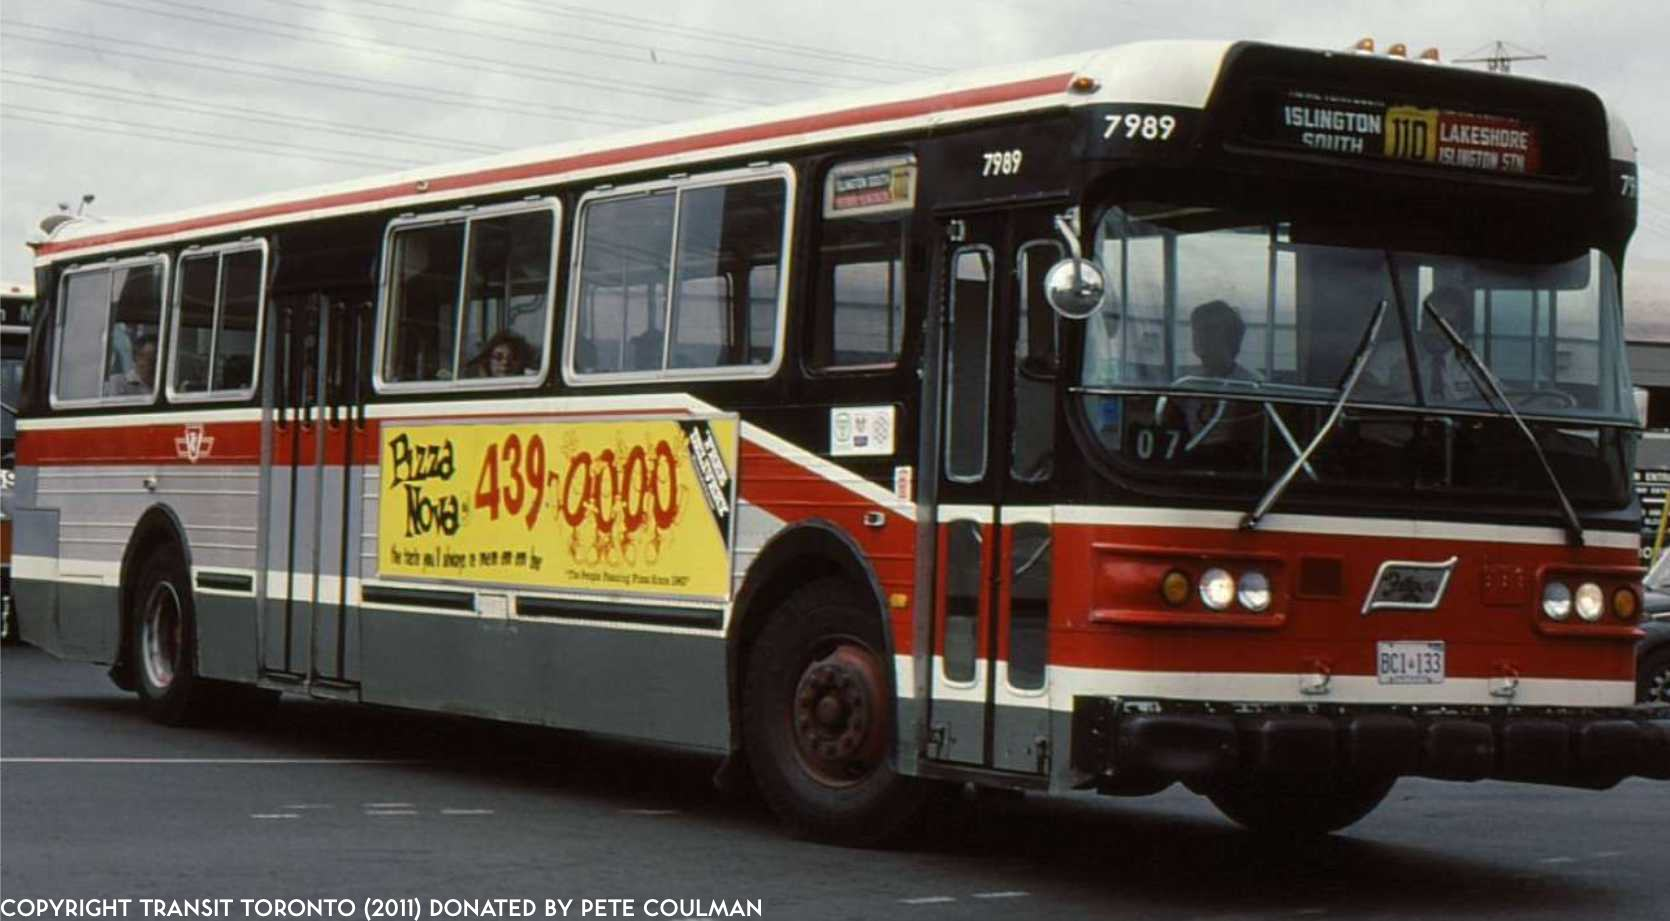 El juego de las imagenes-http://transit.toronto.on.ca/photos/images/ttc-7989-110-islington-south-1988.jpg